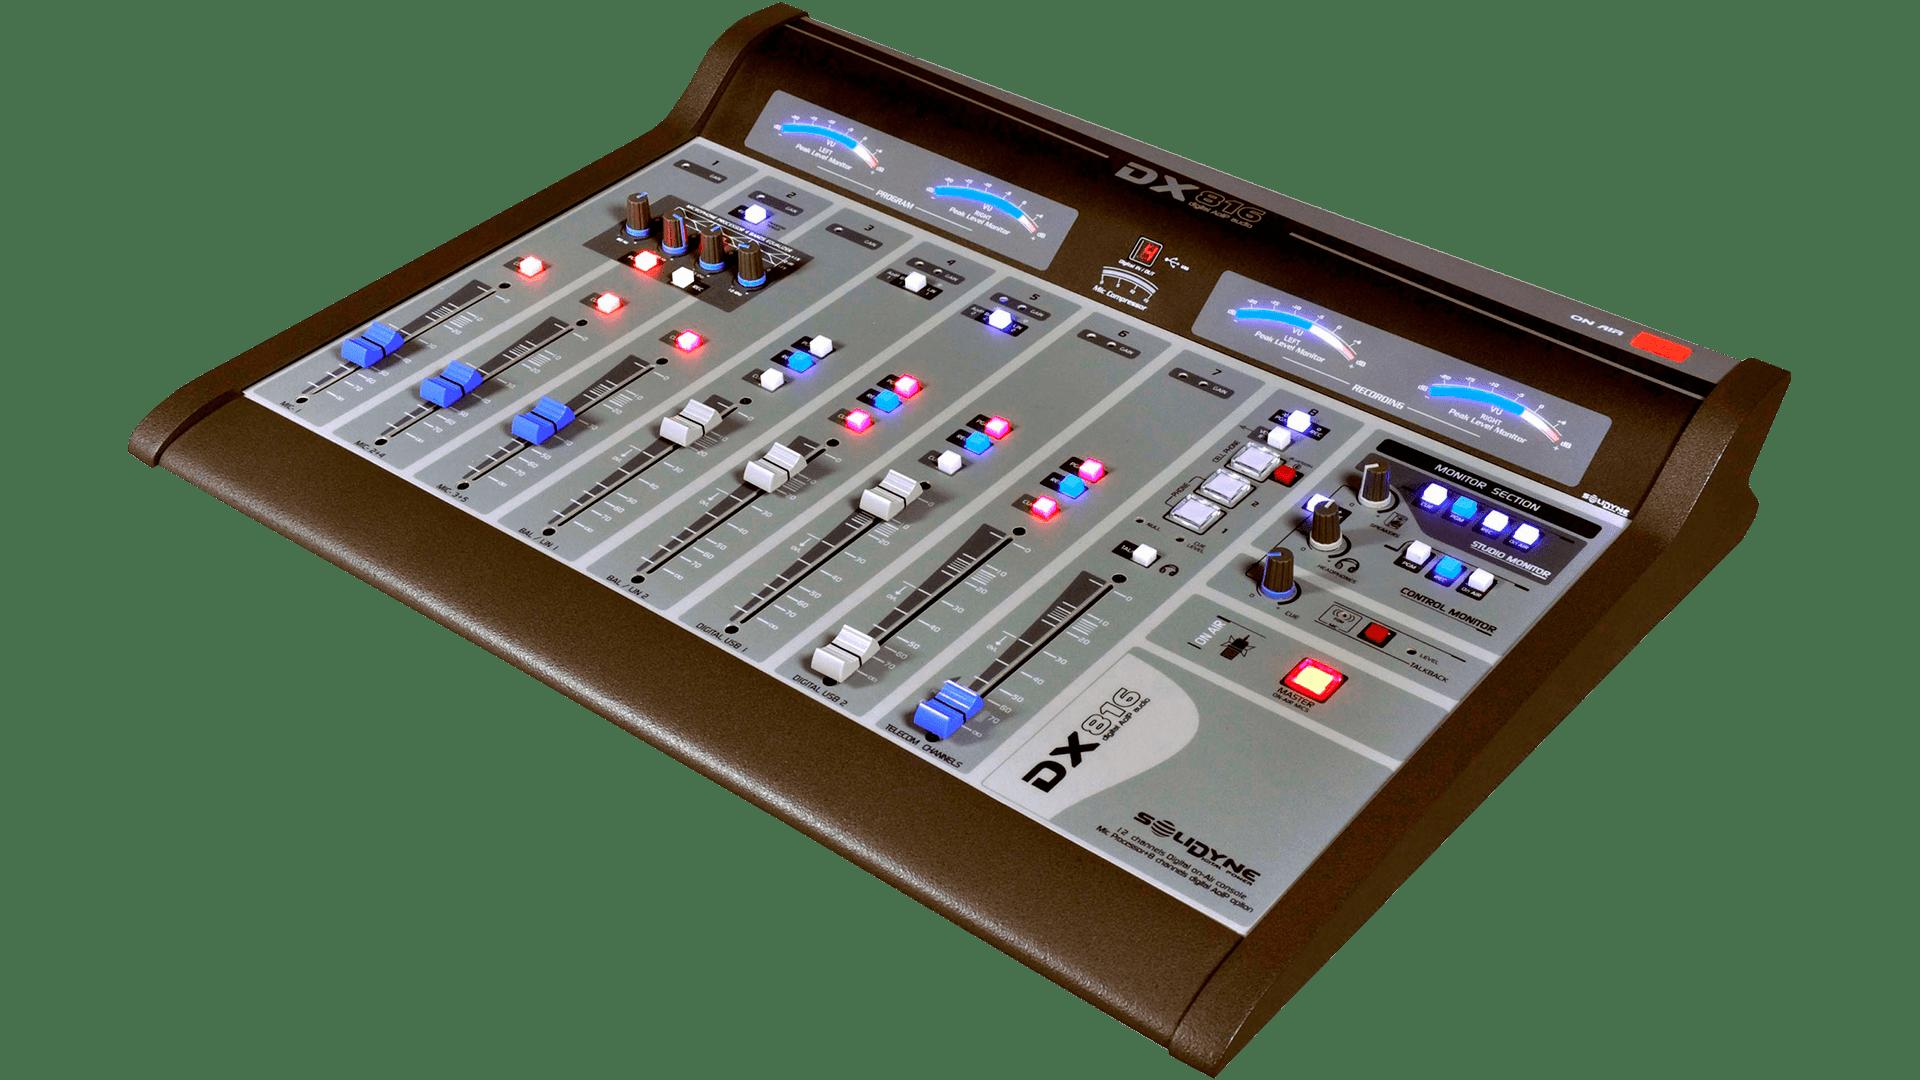 Consola-DX816-Mixer-Streaming-Solidyne-Televisión-Radio-Emisoras-FM-AM-Internet-Virtual-Online-Buena-Imagen-Bogotá-Colombia